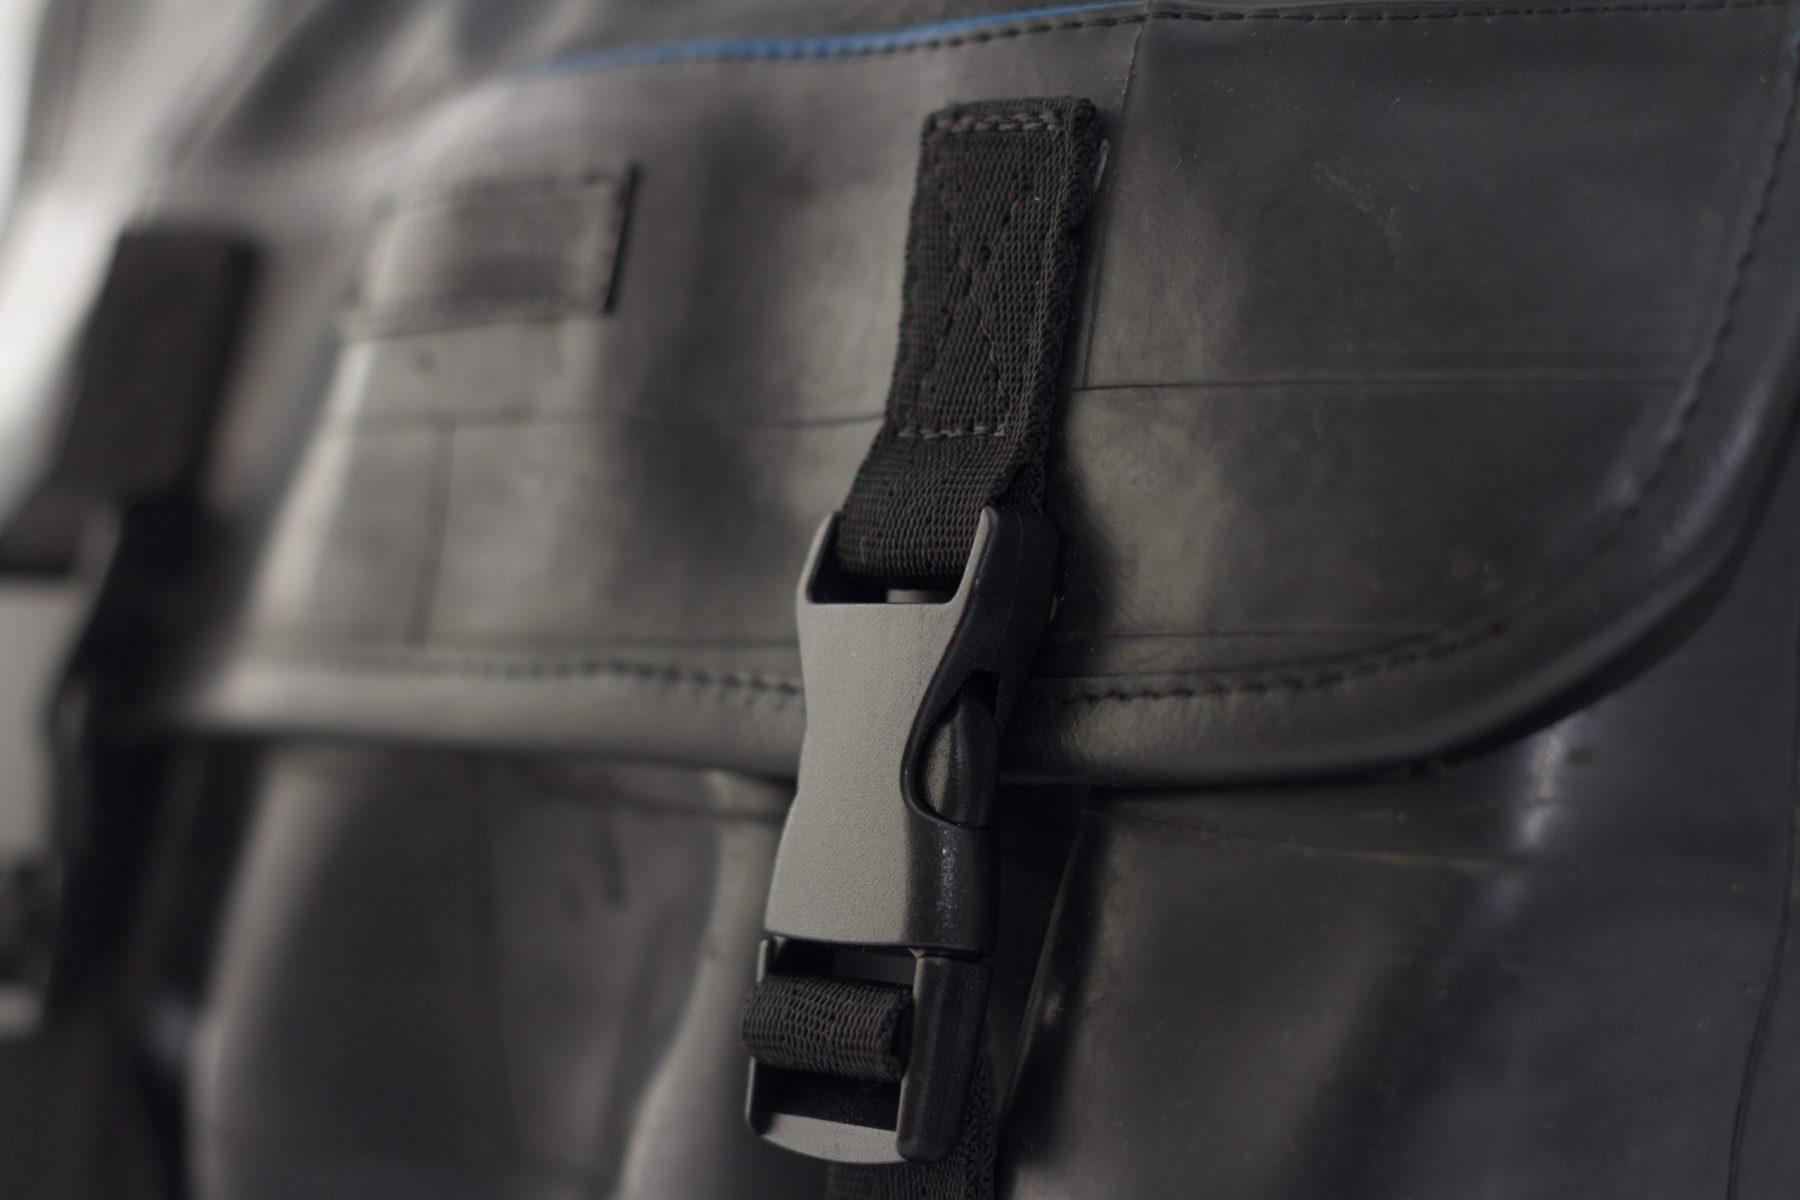 NeoMatic Prototype N Messenger Bag